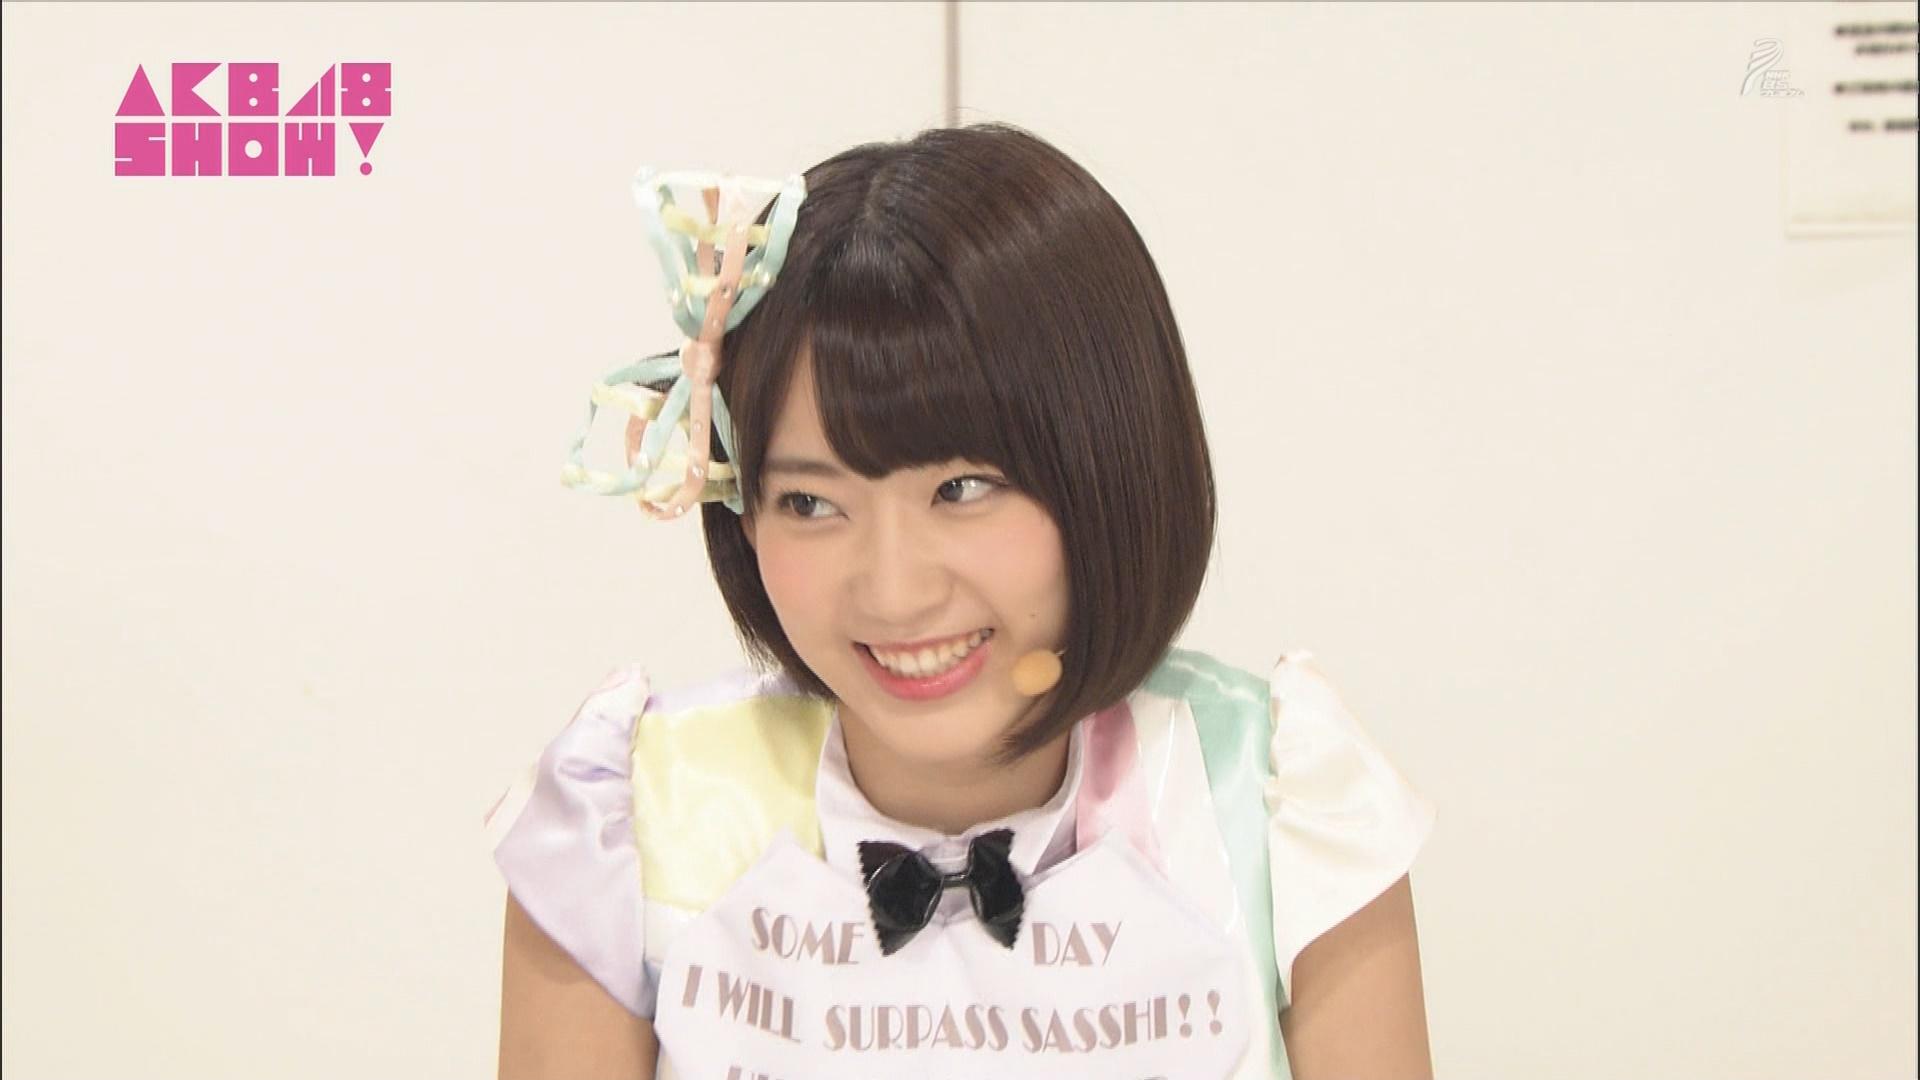 AKB48SHOW 心のプラカード 宮脇咲良 20140830 (9)